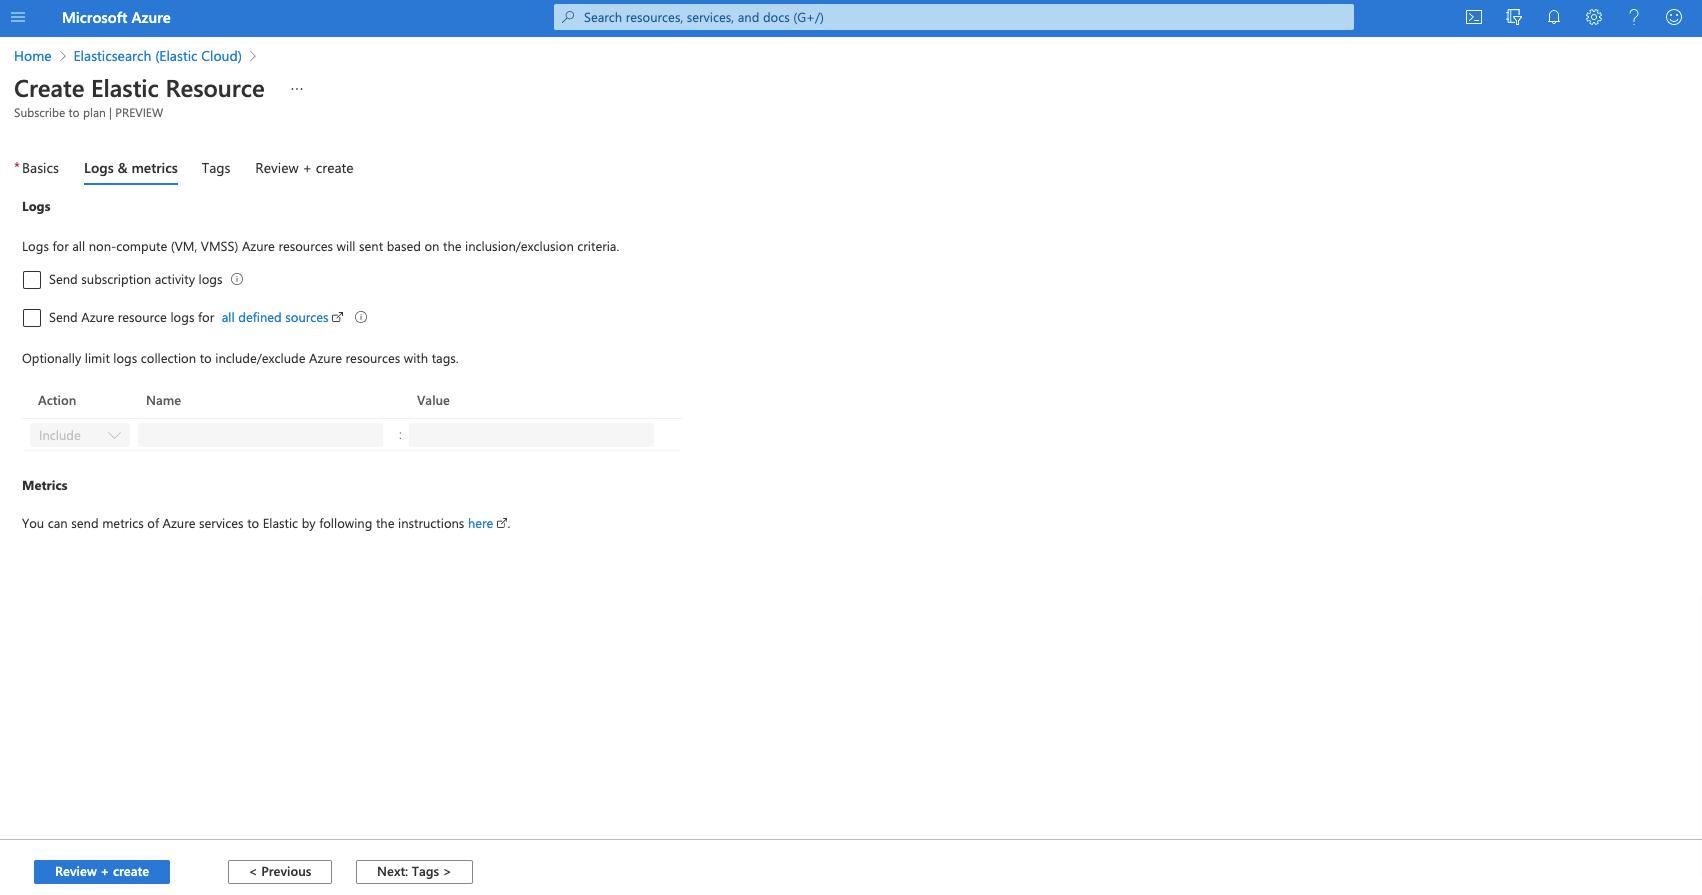 Screenshot of how to create an Elastic resource